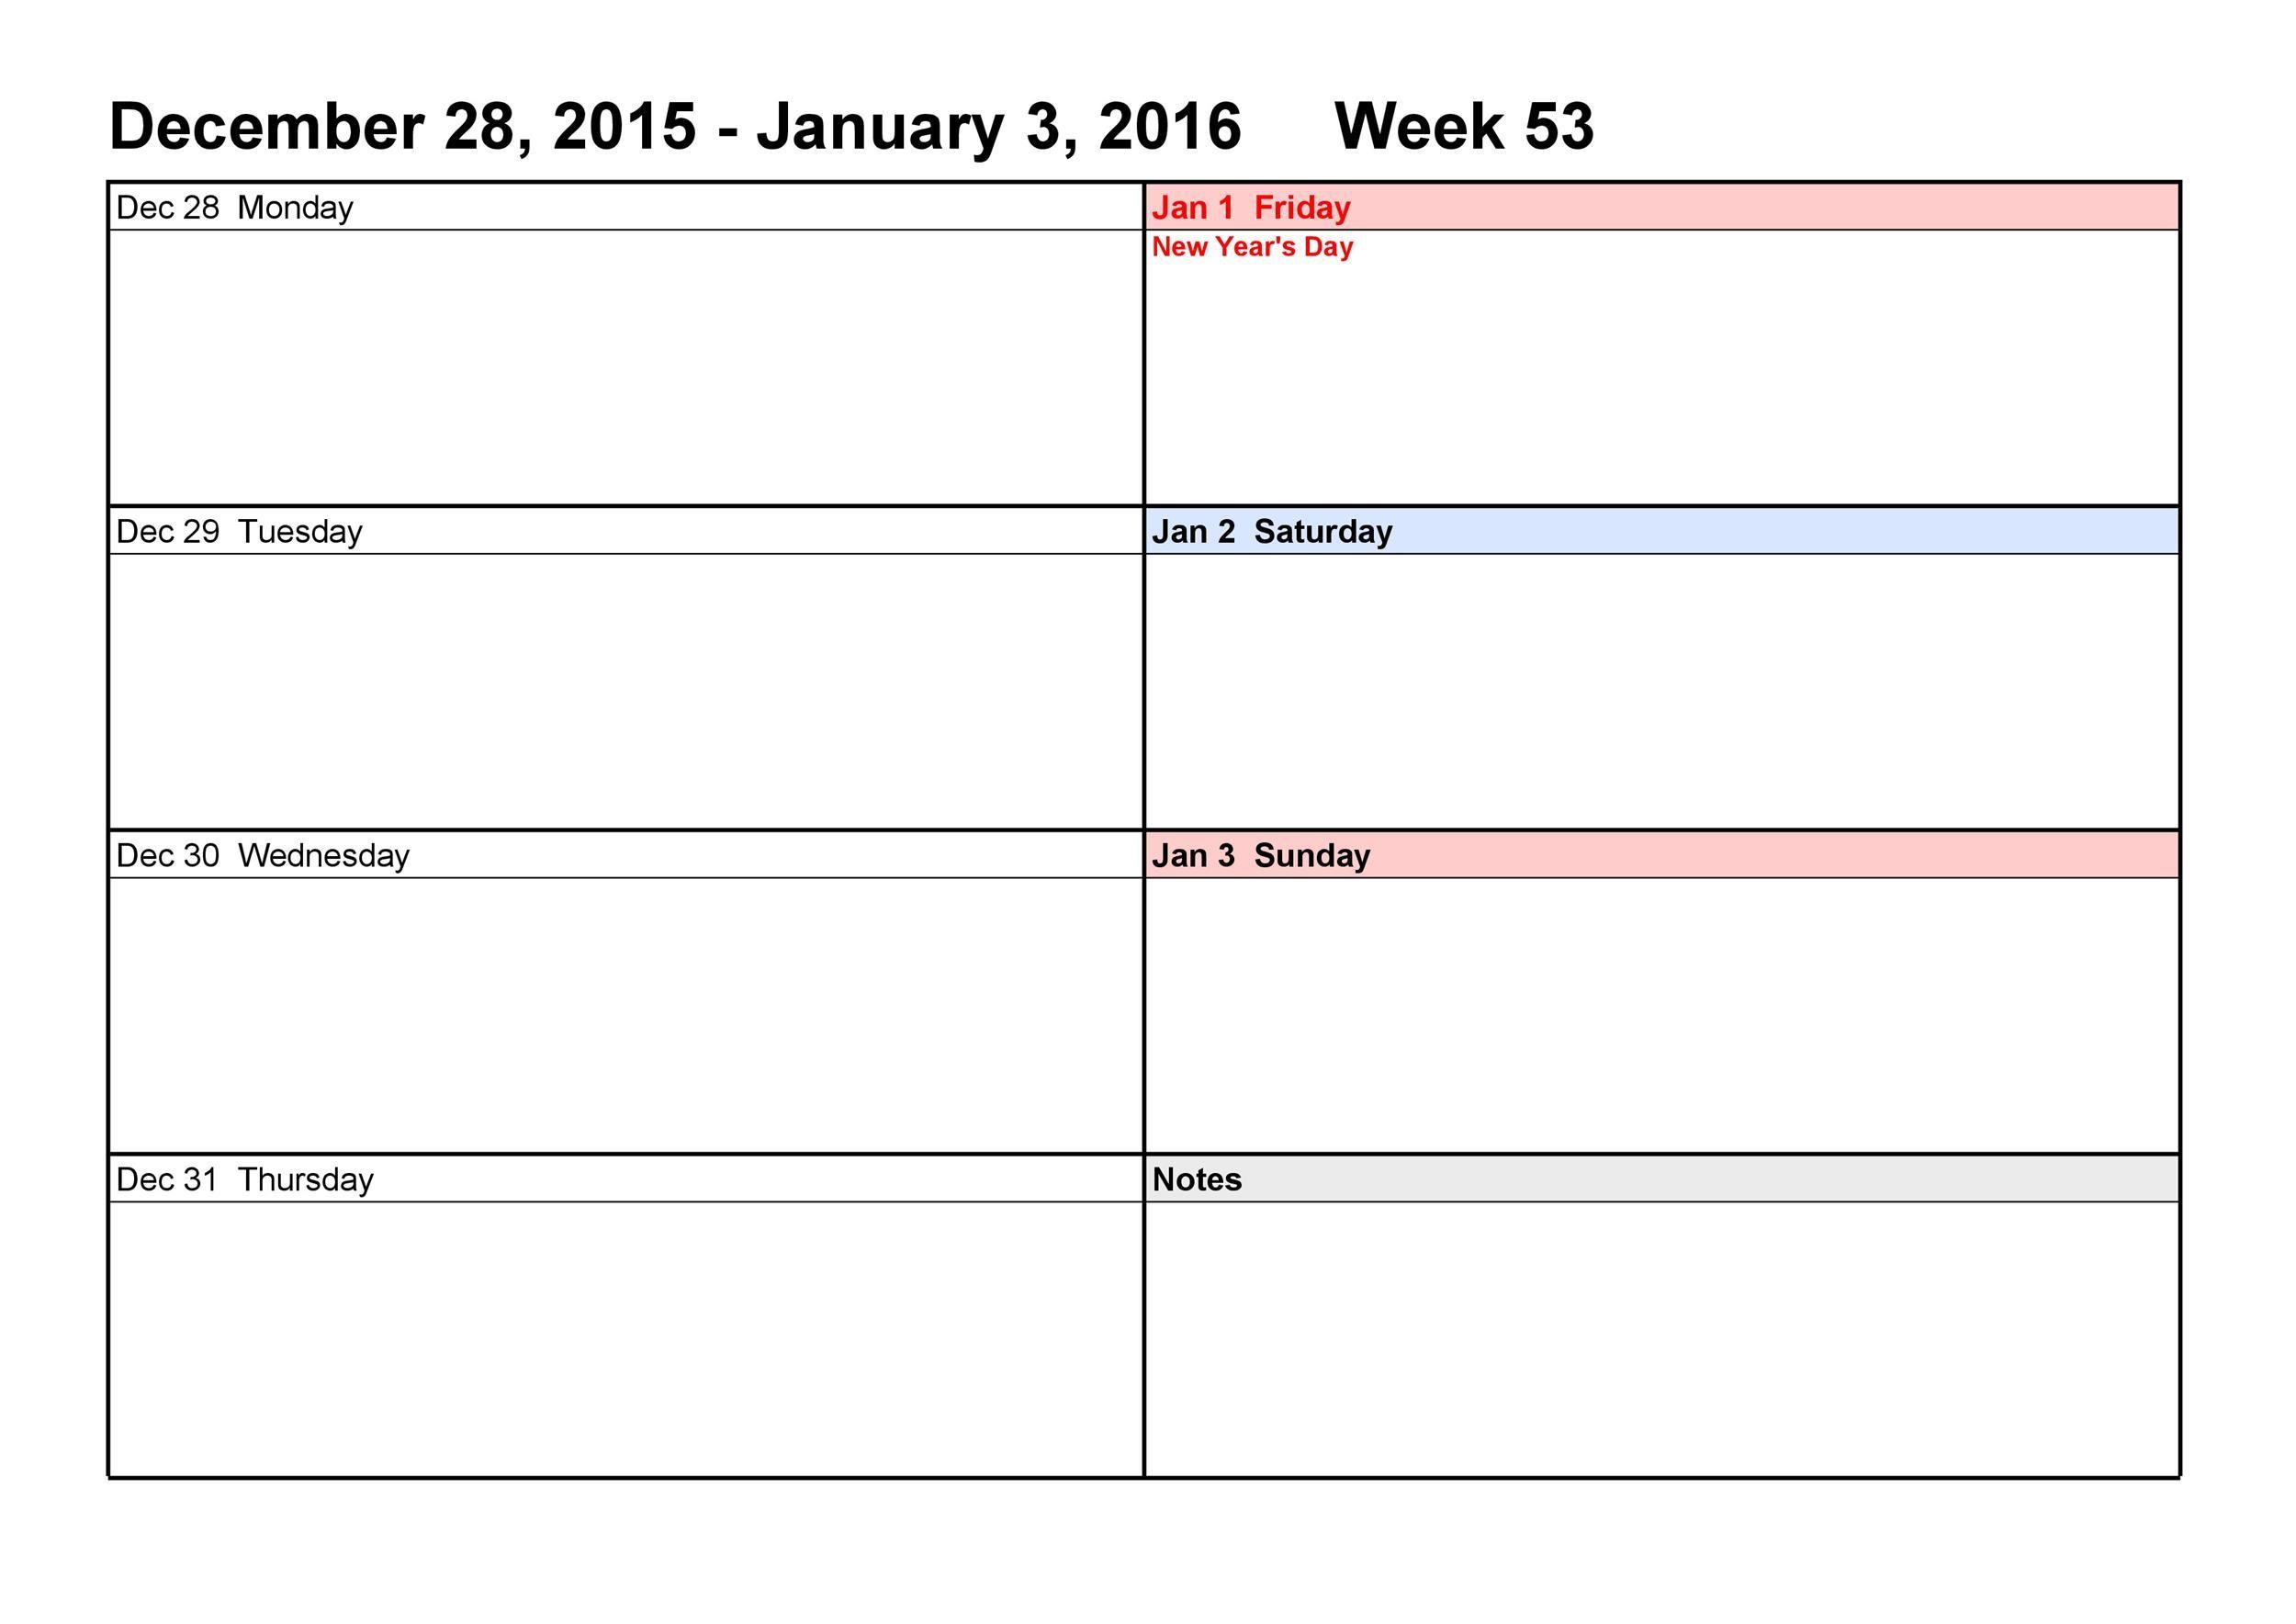 26 Blank Weekly Calendar Templates PDF, Excel, Word ᐅ ...